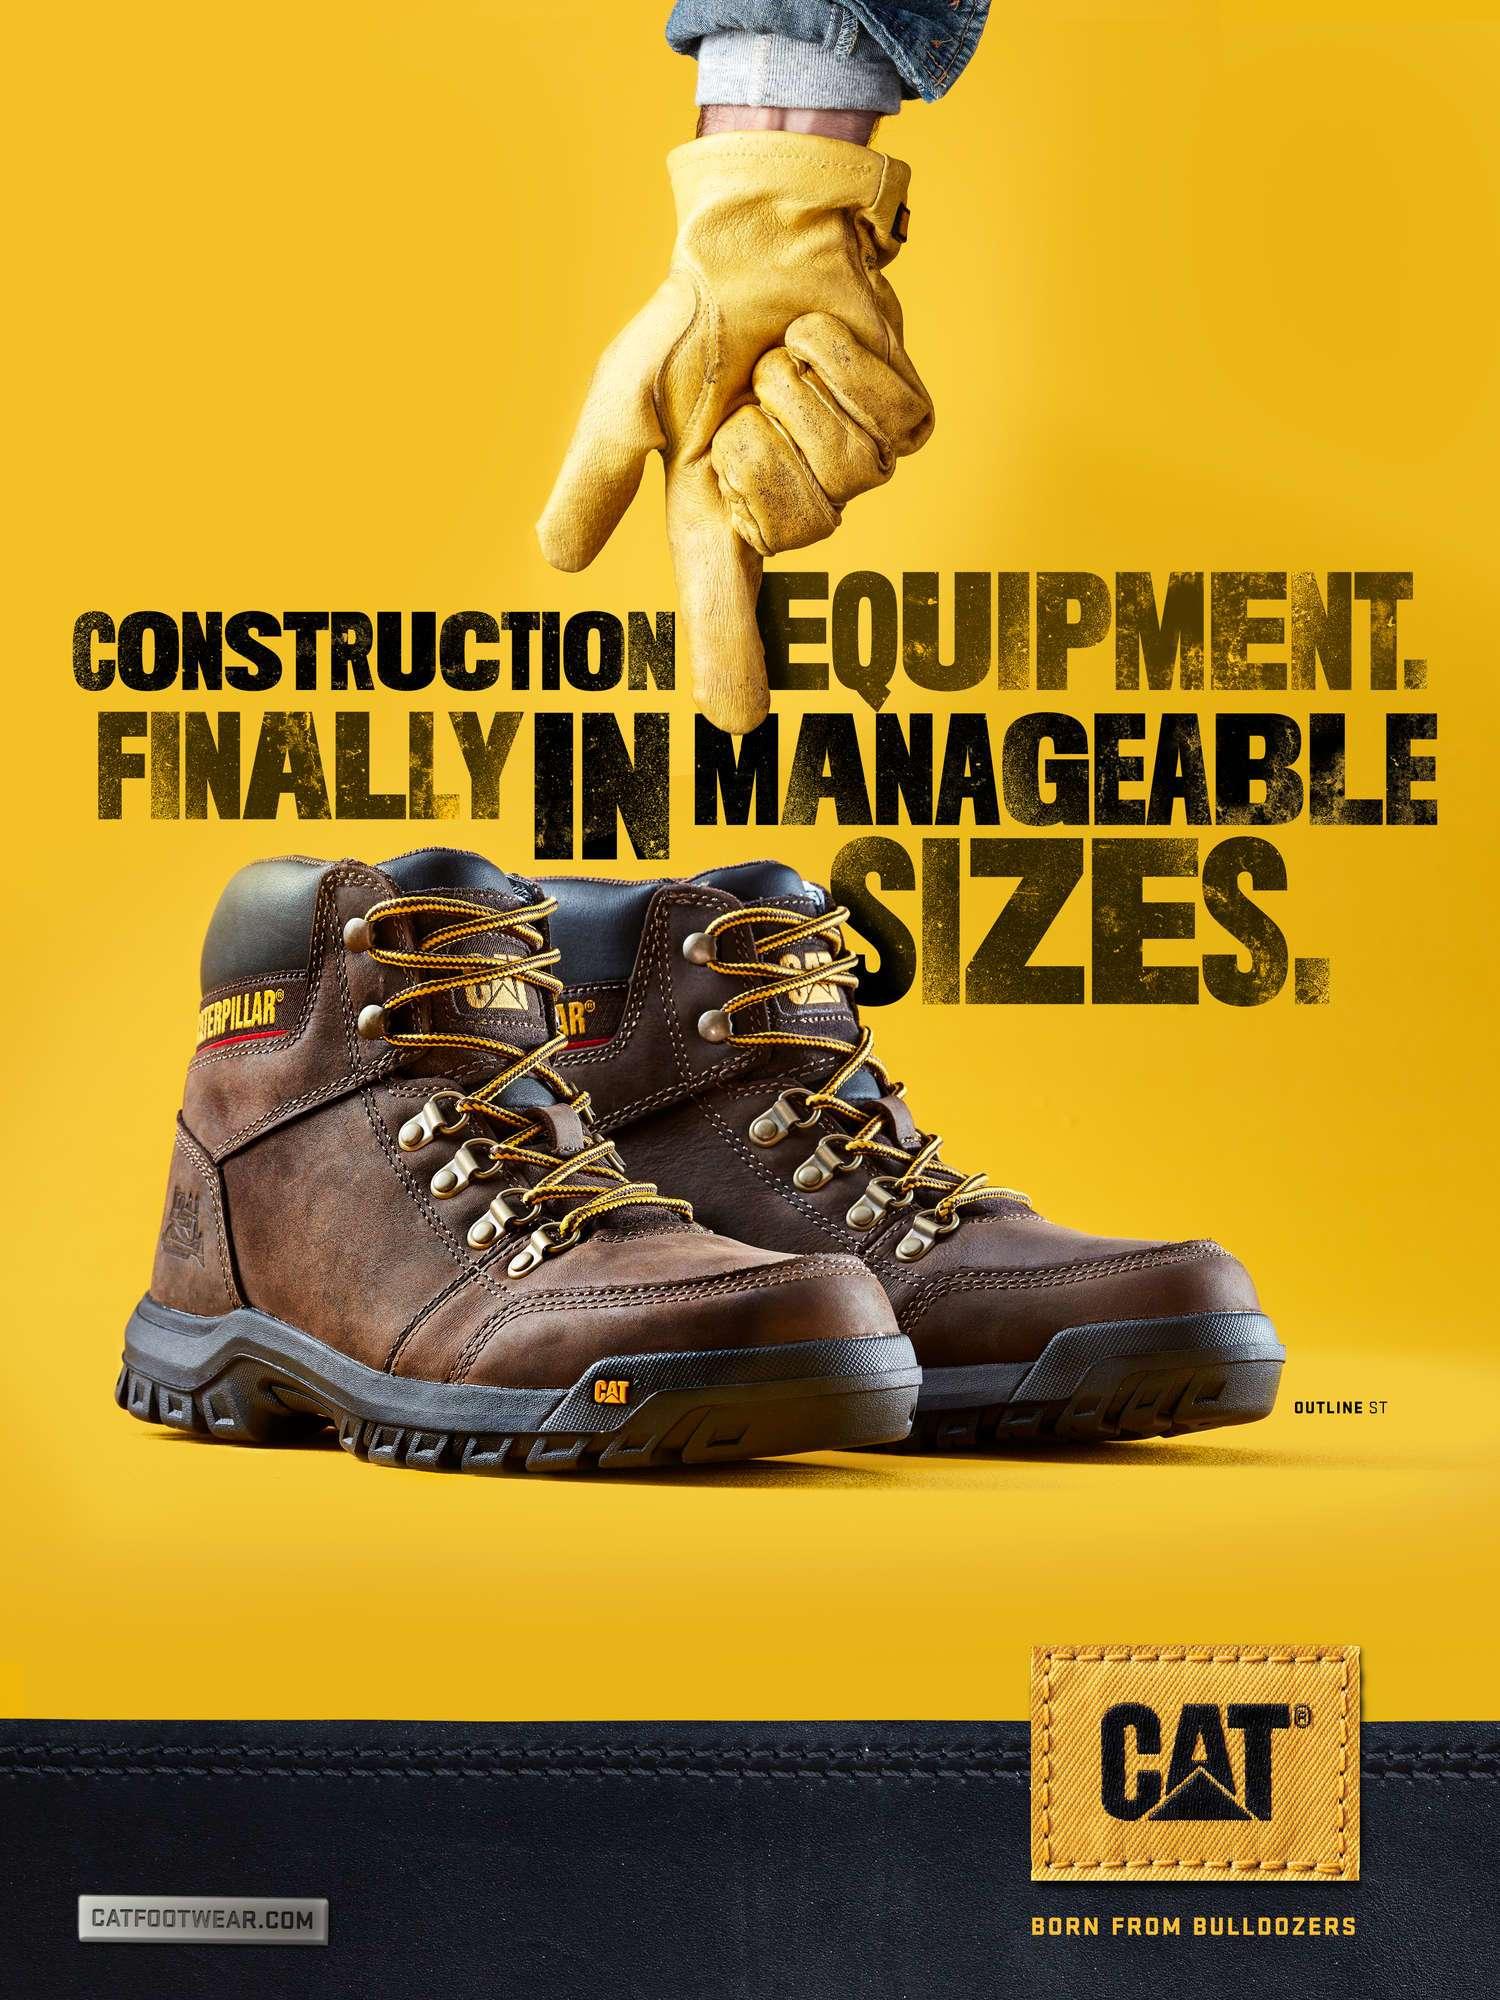 cat-construction-equipment.jpg